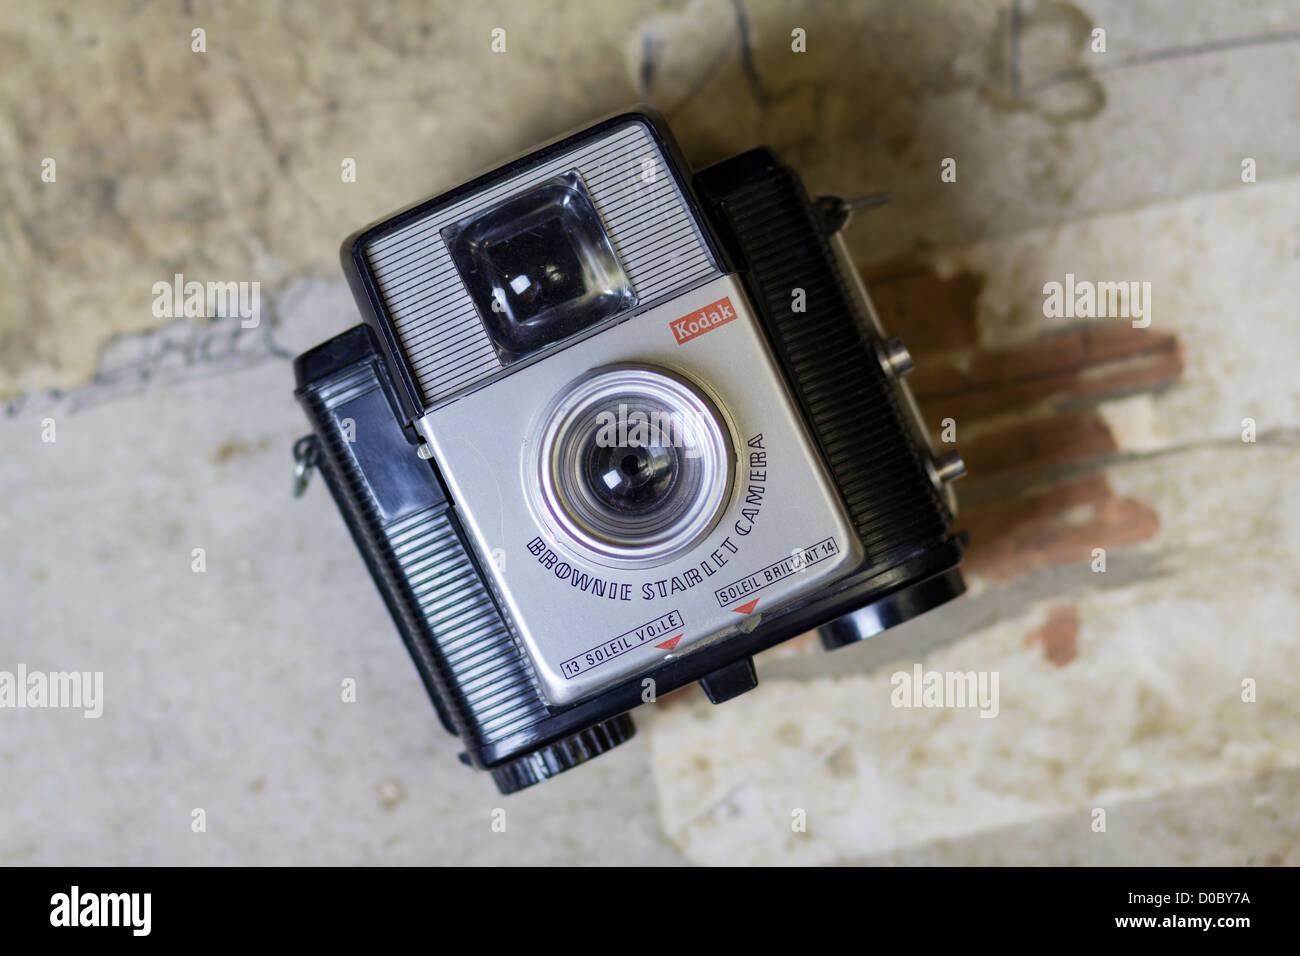 Vintage Kodak Brownie Starlet camera french version - Stock Image